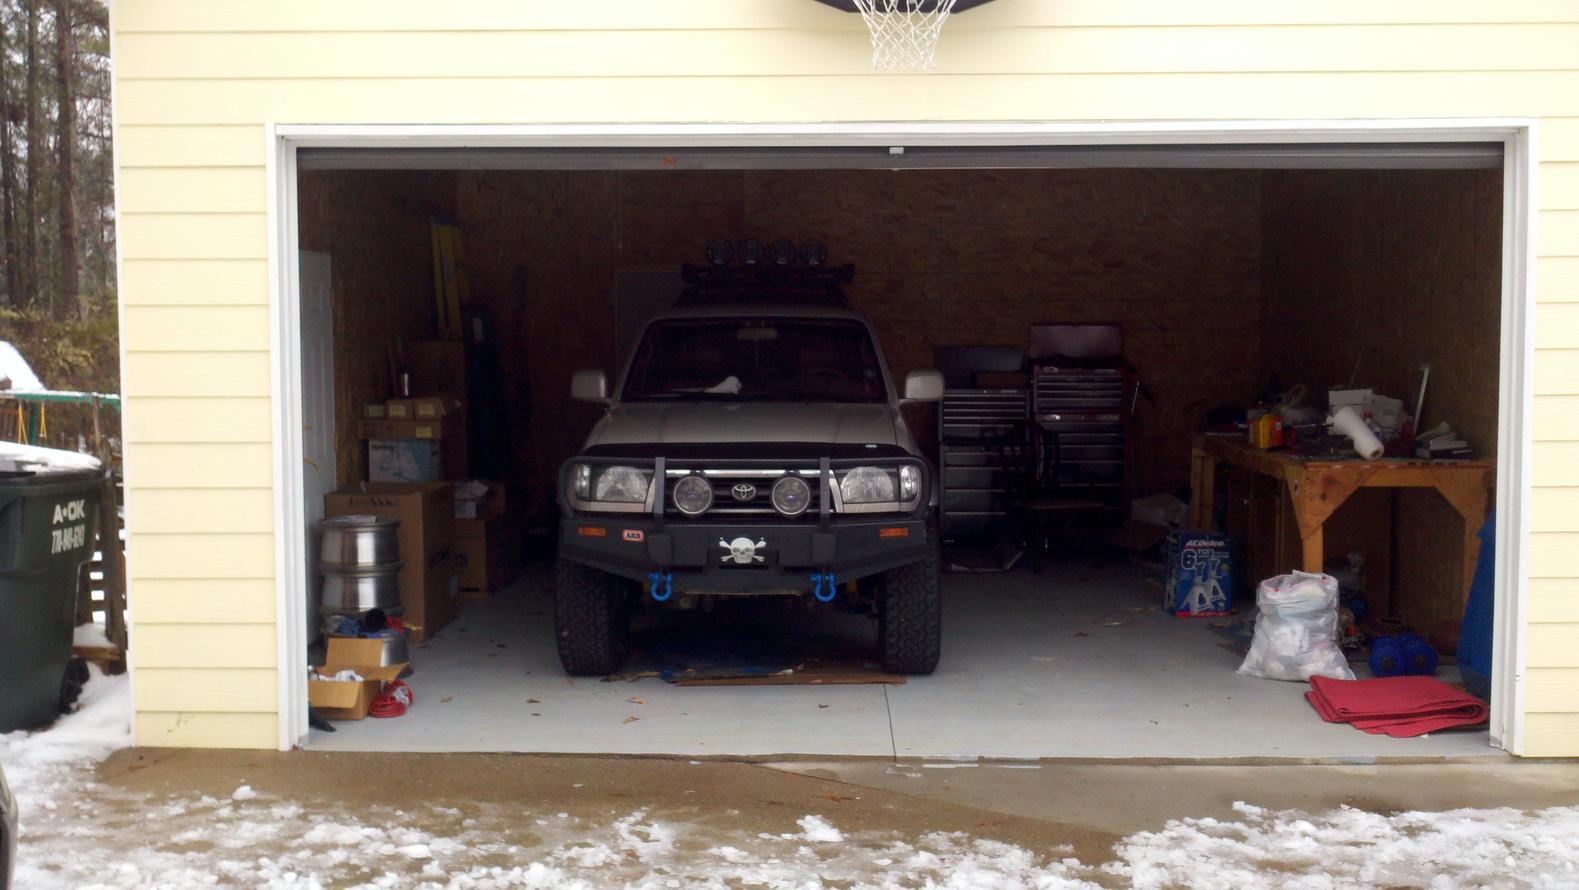 890 #9D2E3F 98 4Runner Limited Desert Dune 4WD Lifted Locked TJM'd OME'd LC picture/photo Millennium Garage Doors 36191579